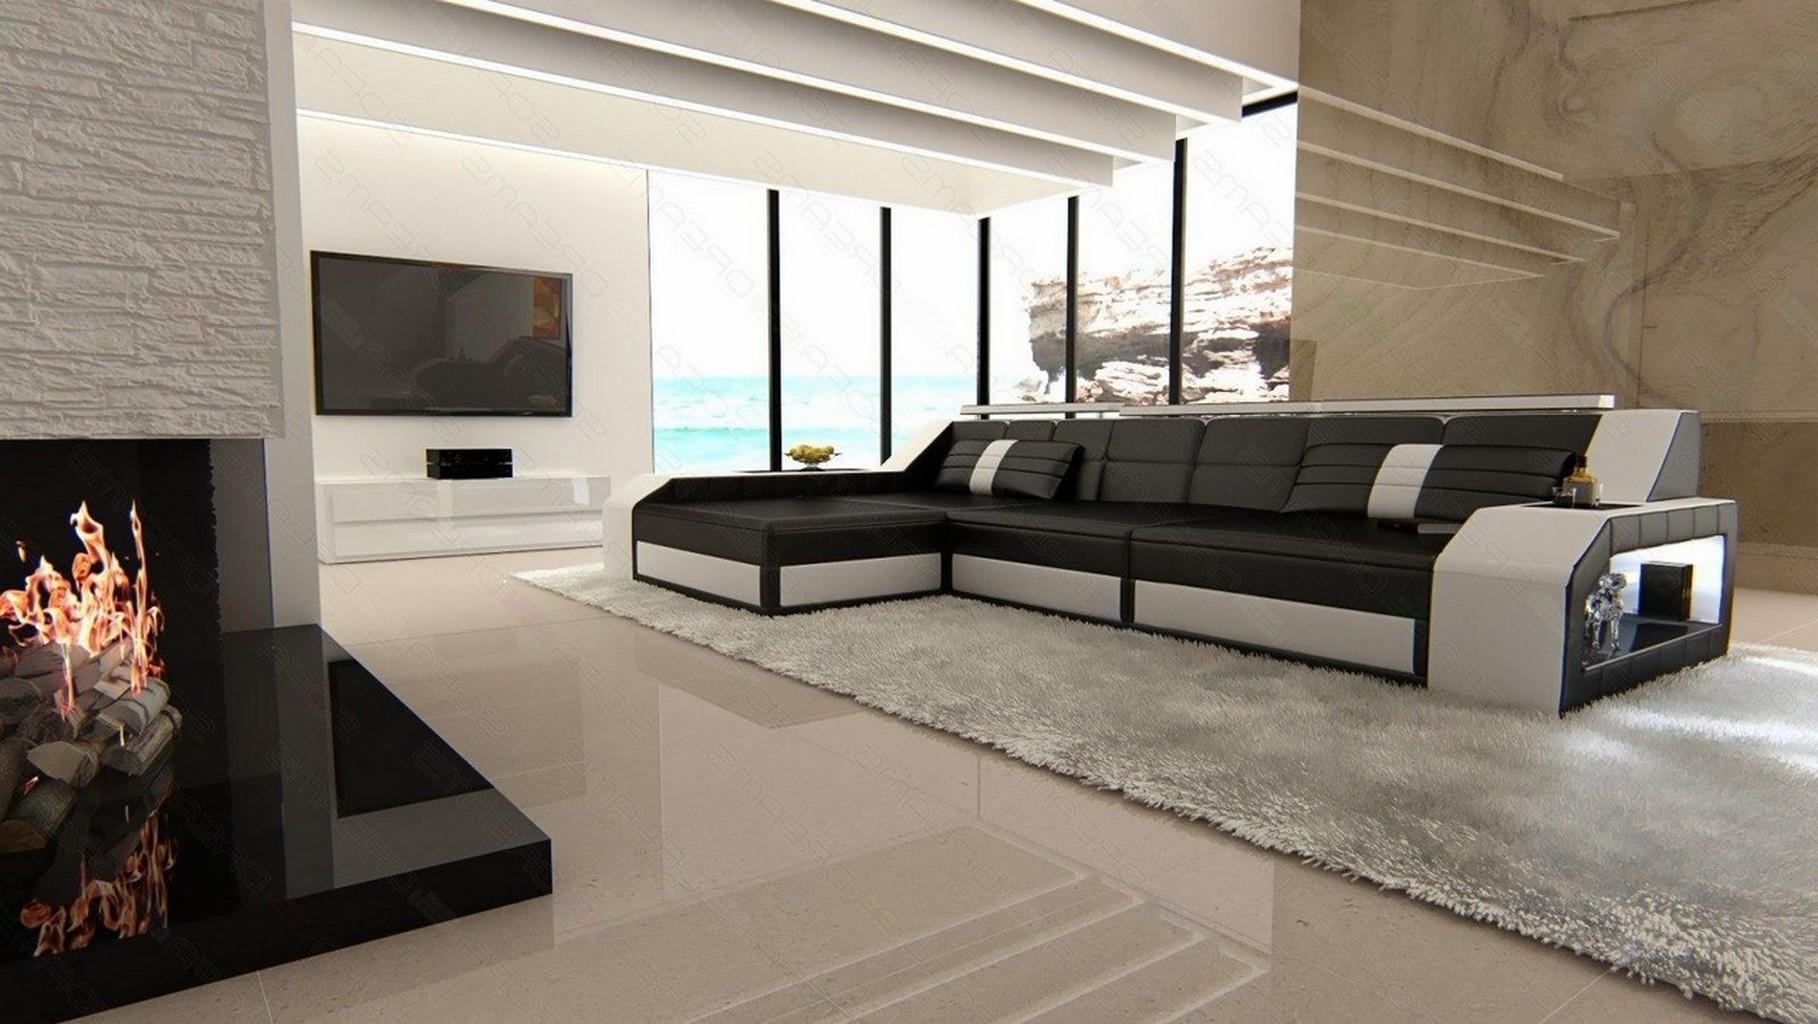 ledersofa arezzo l form eckcouch mit beleuchtung schwarz weiss ebay. Black Bedroom Furniture Sets. Home Design Ideas